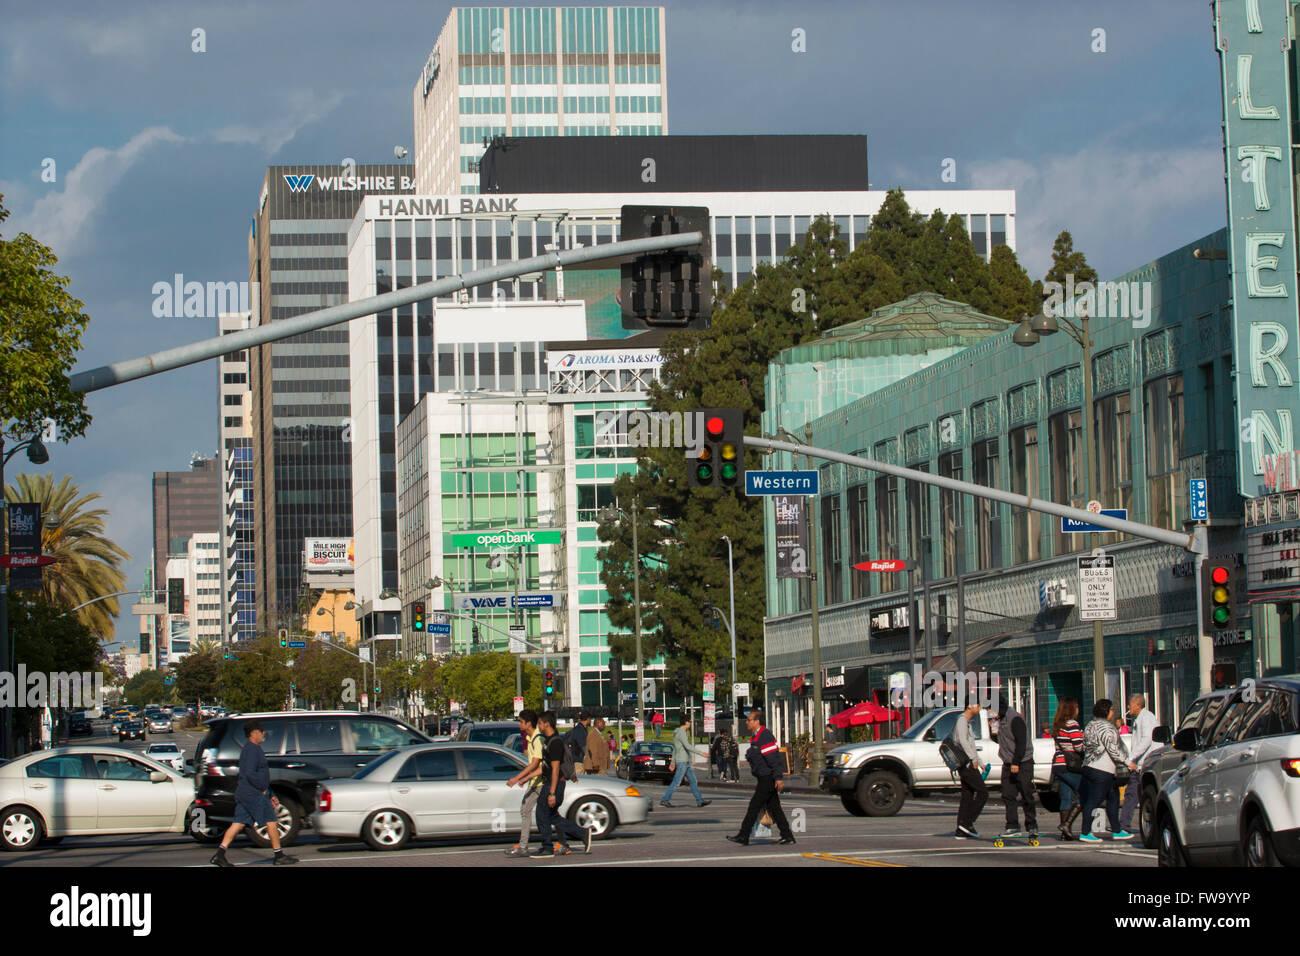 Wilshire boulevard in Los Angeles - Stock Image